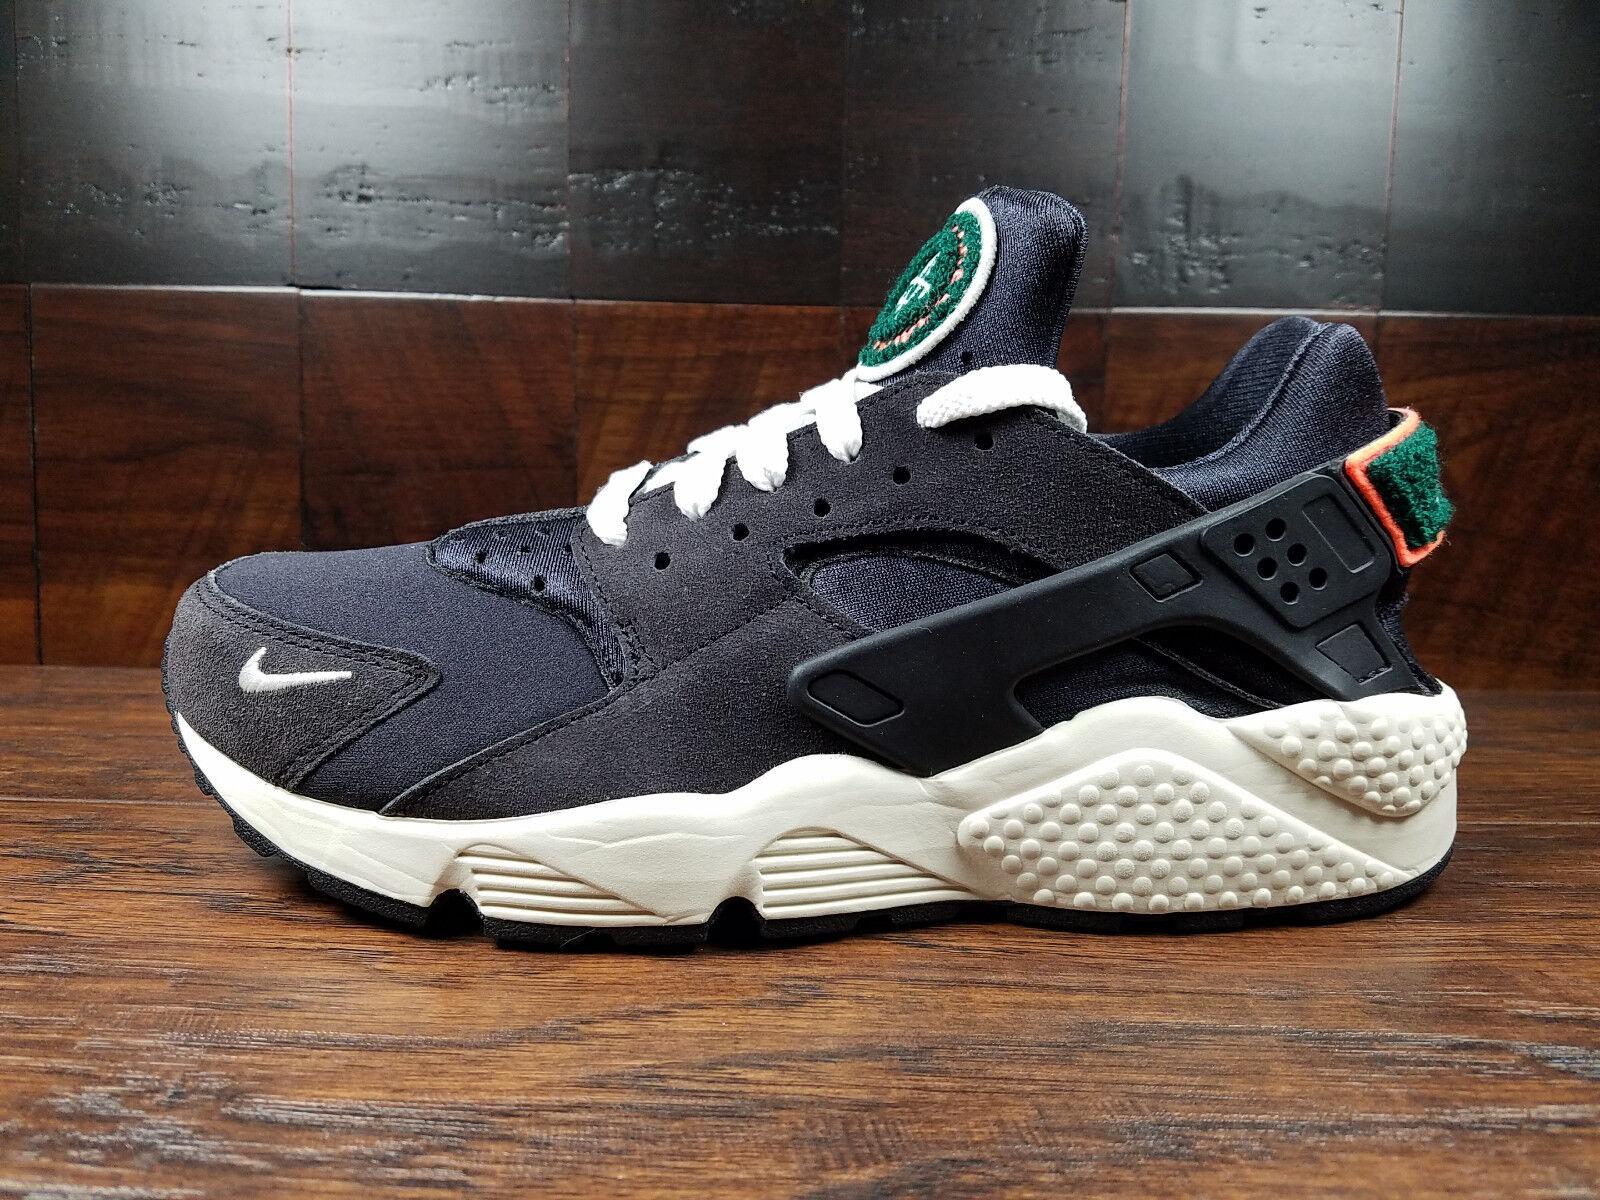 Nike Air Huarache Run Premium (Oil Grey Grey Grey Sail-Rainforest) 704830-015 MENS 8-12 aaf4ed